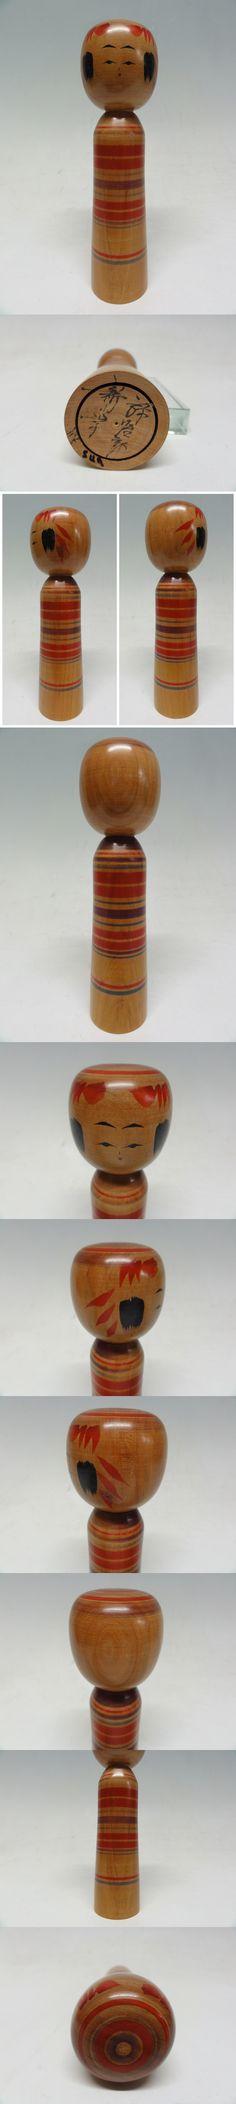 Niiyama Manabu 新山学 (1930- ), Master Niiyama Hisashi, 18.5 cm